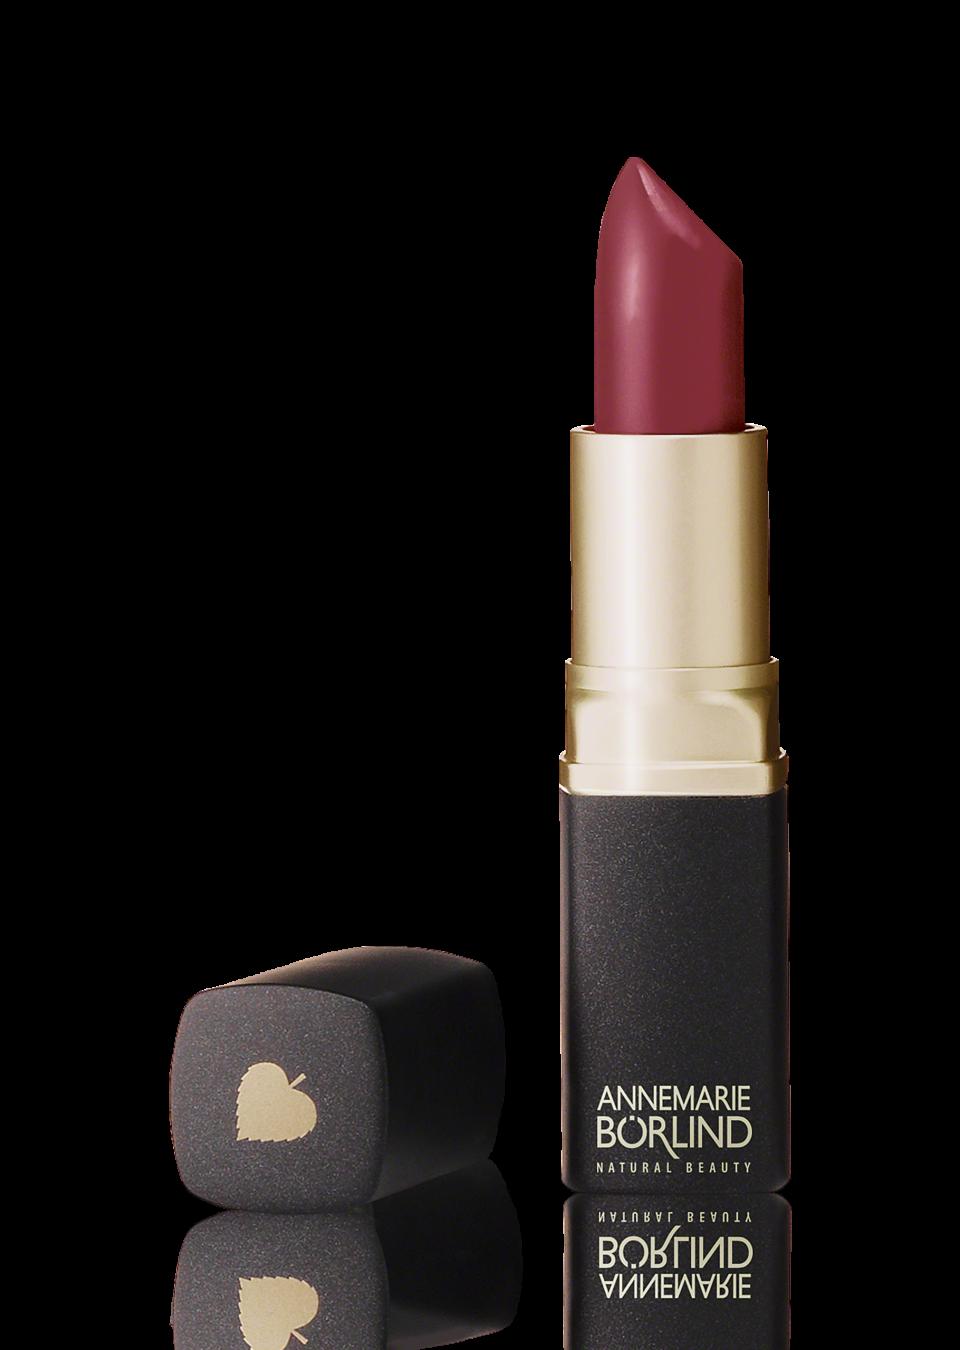 Lippenstift rosewood